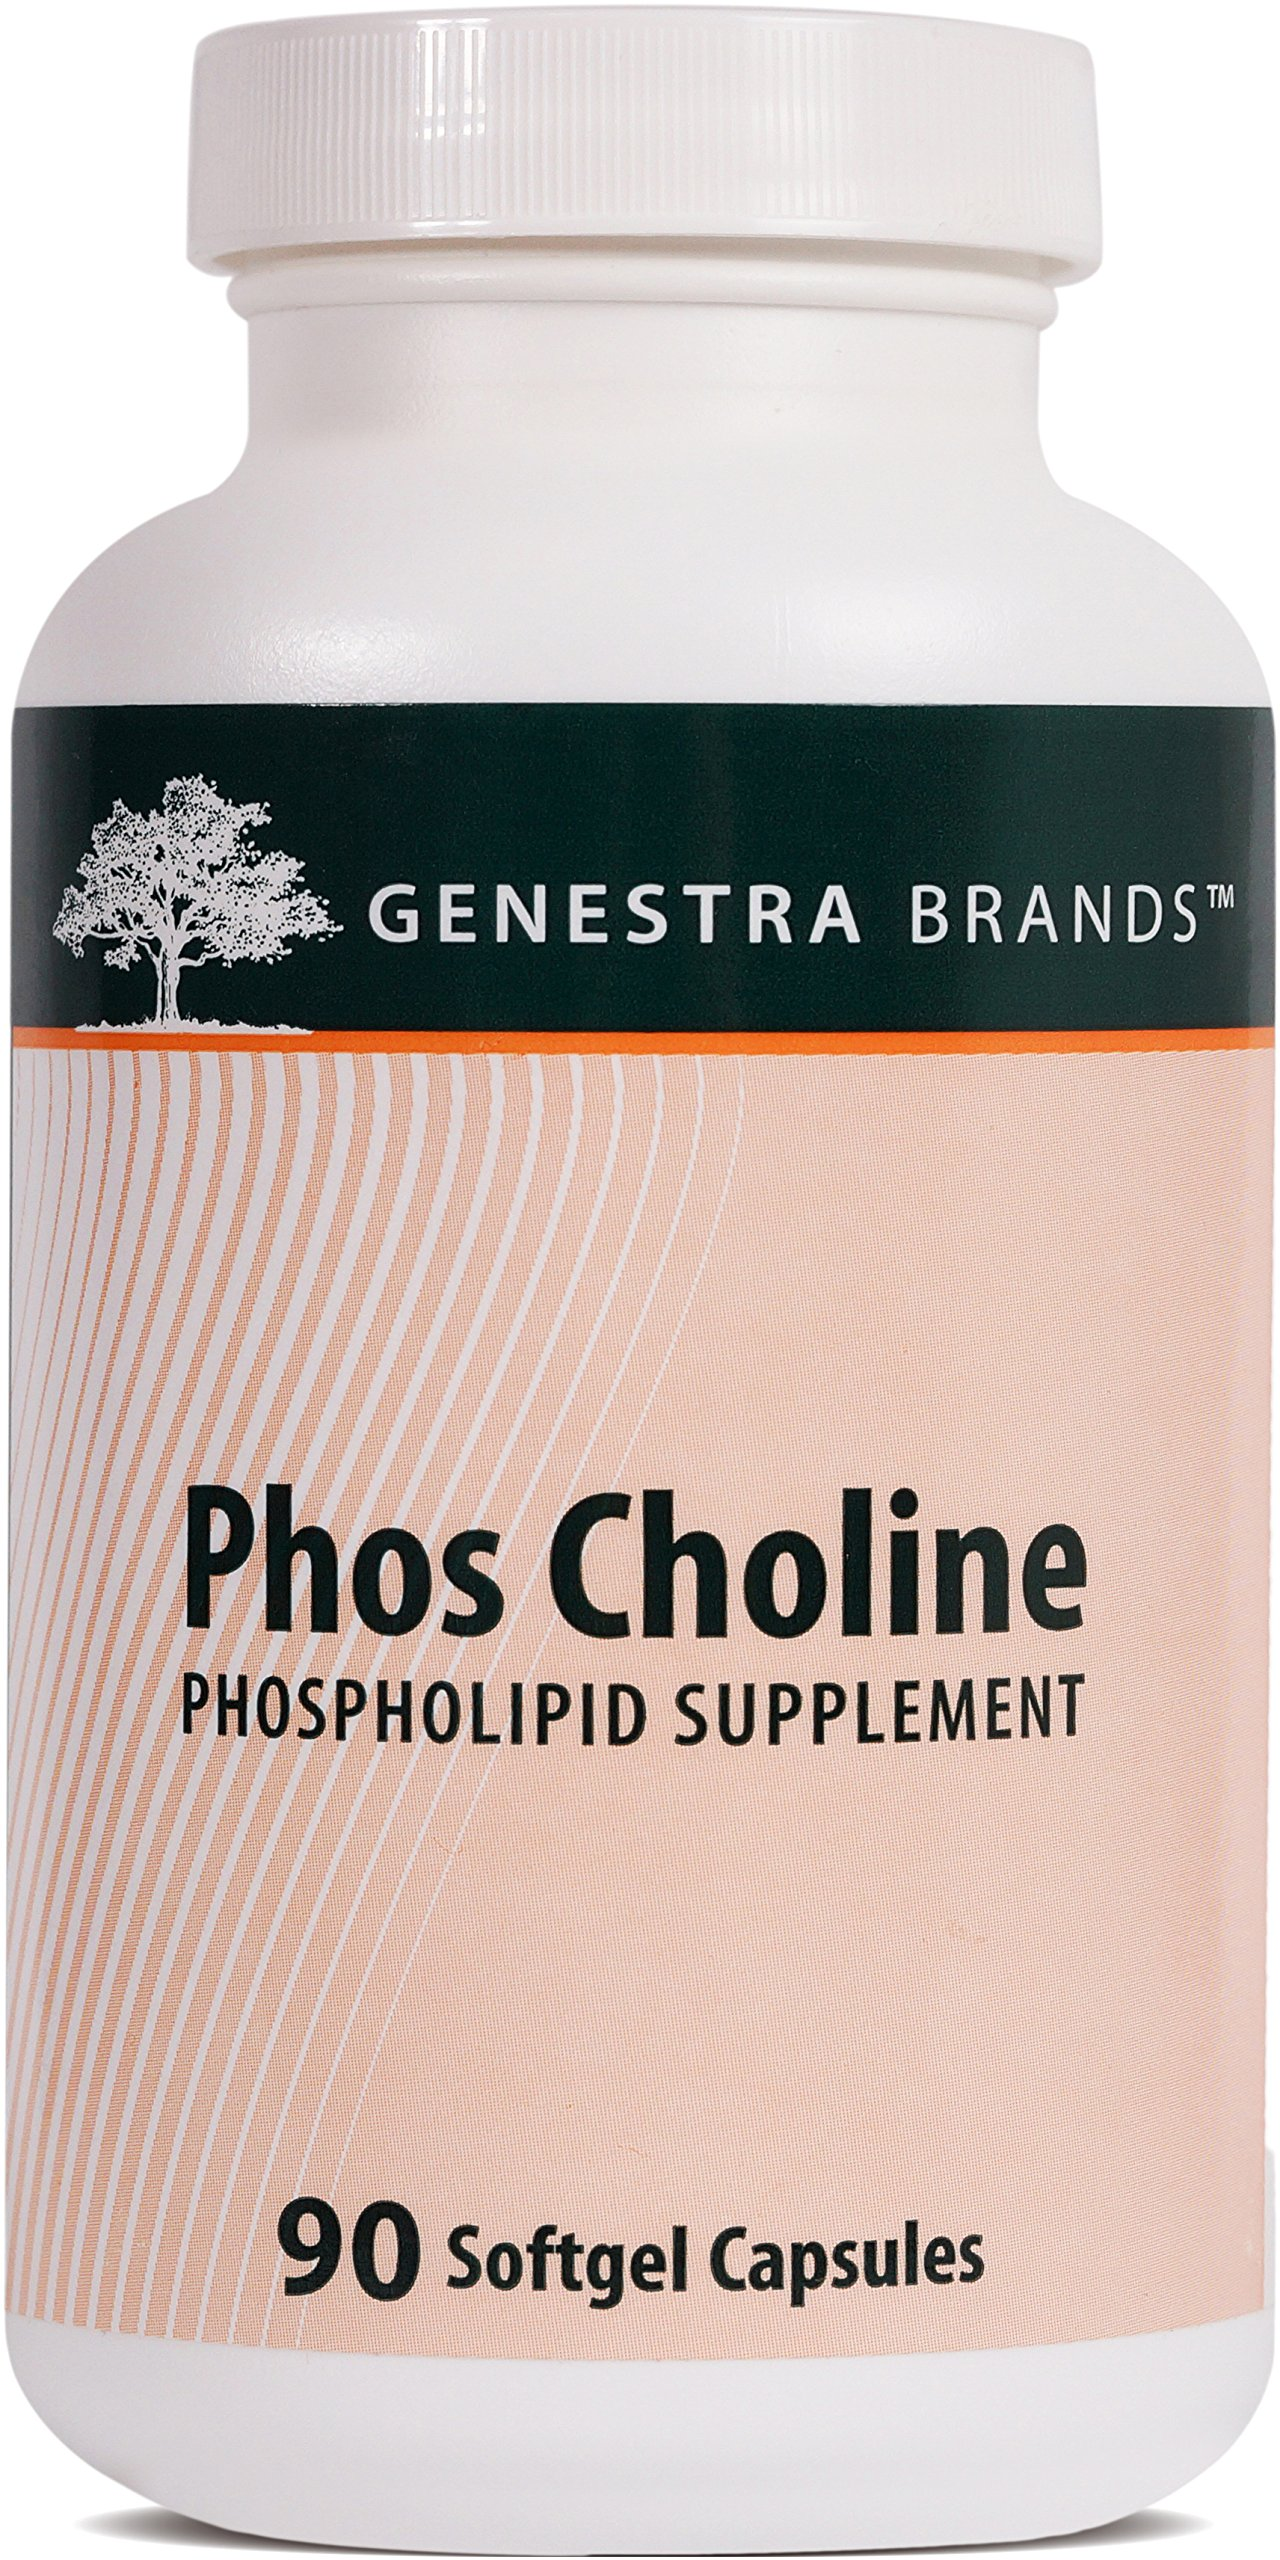 Genestra Brands - Phos Choline - Support Healthy Liver Function* - 90 Softgel Capsules